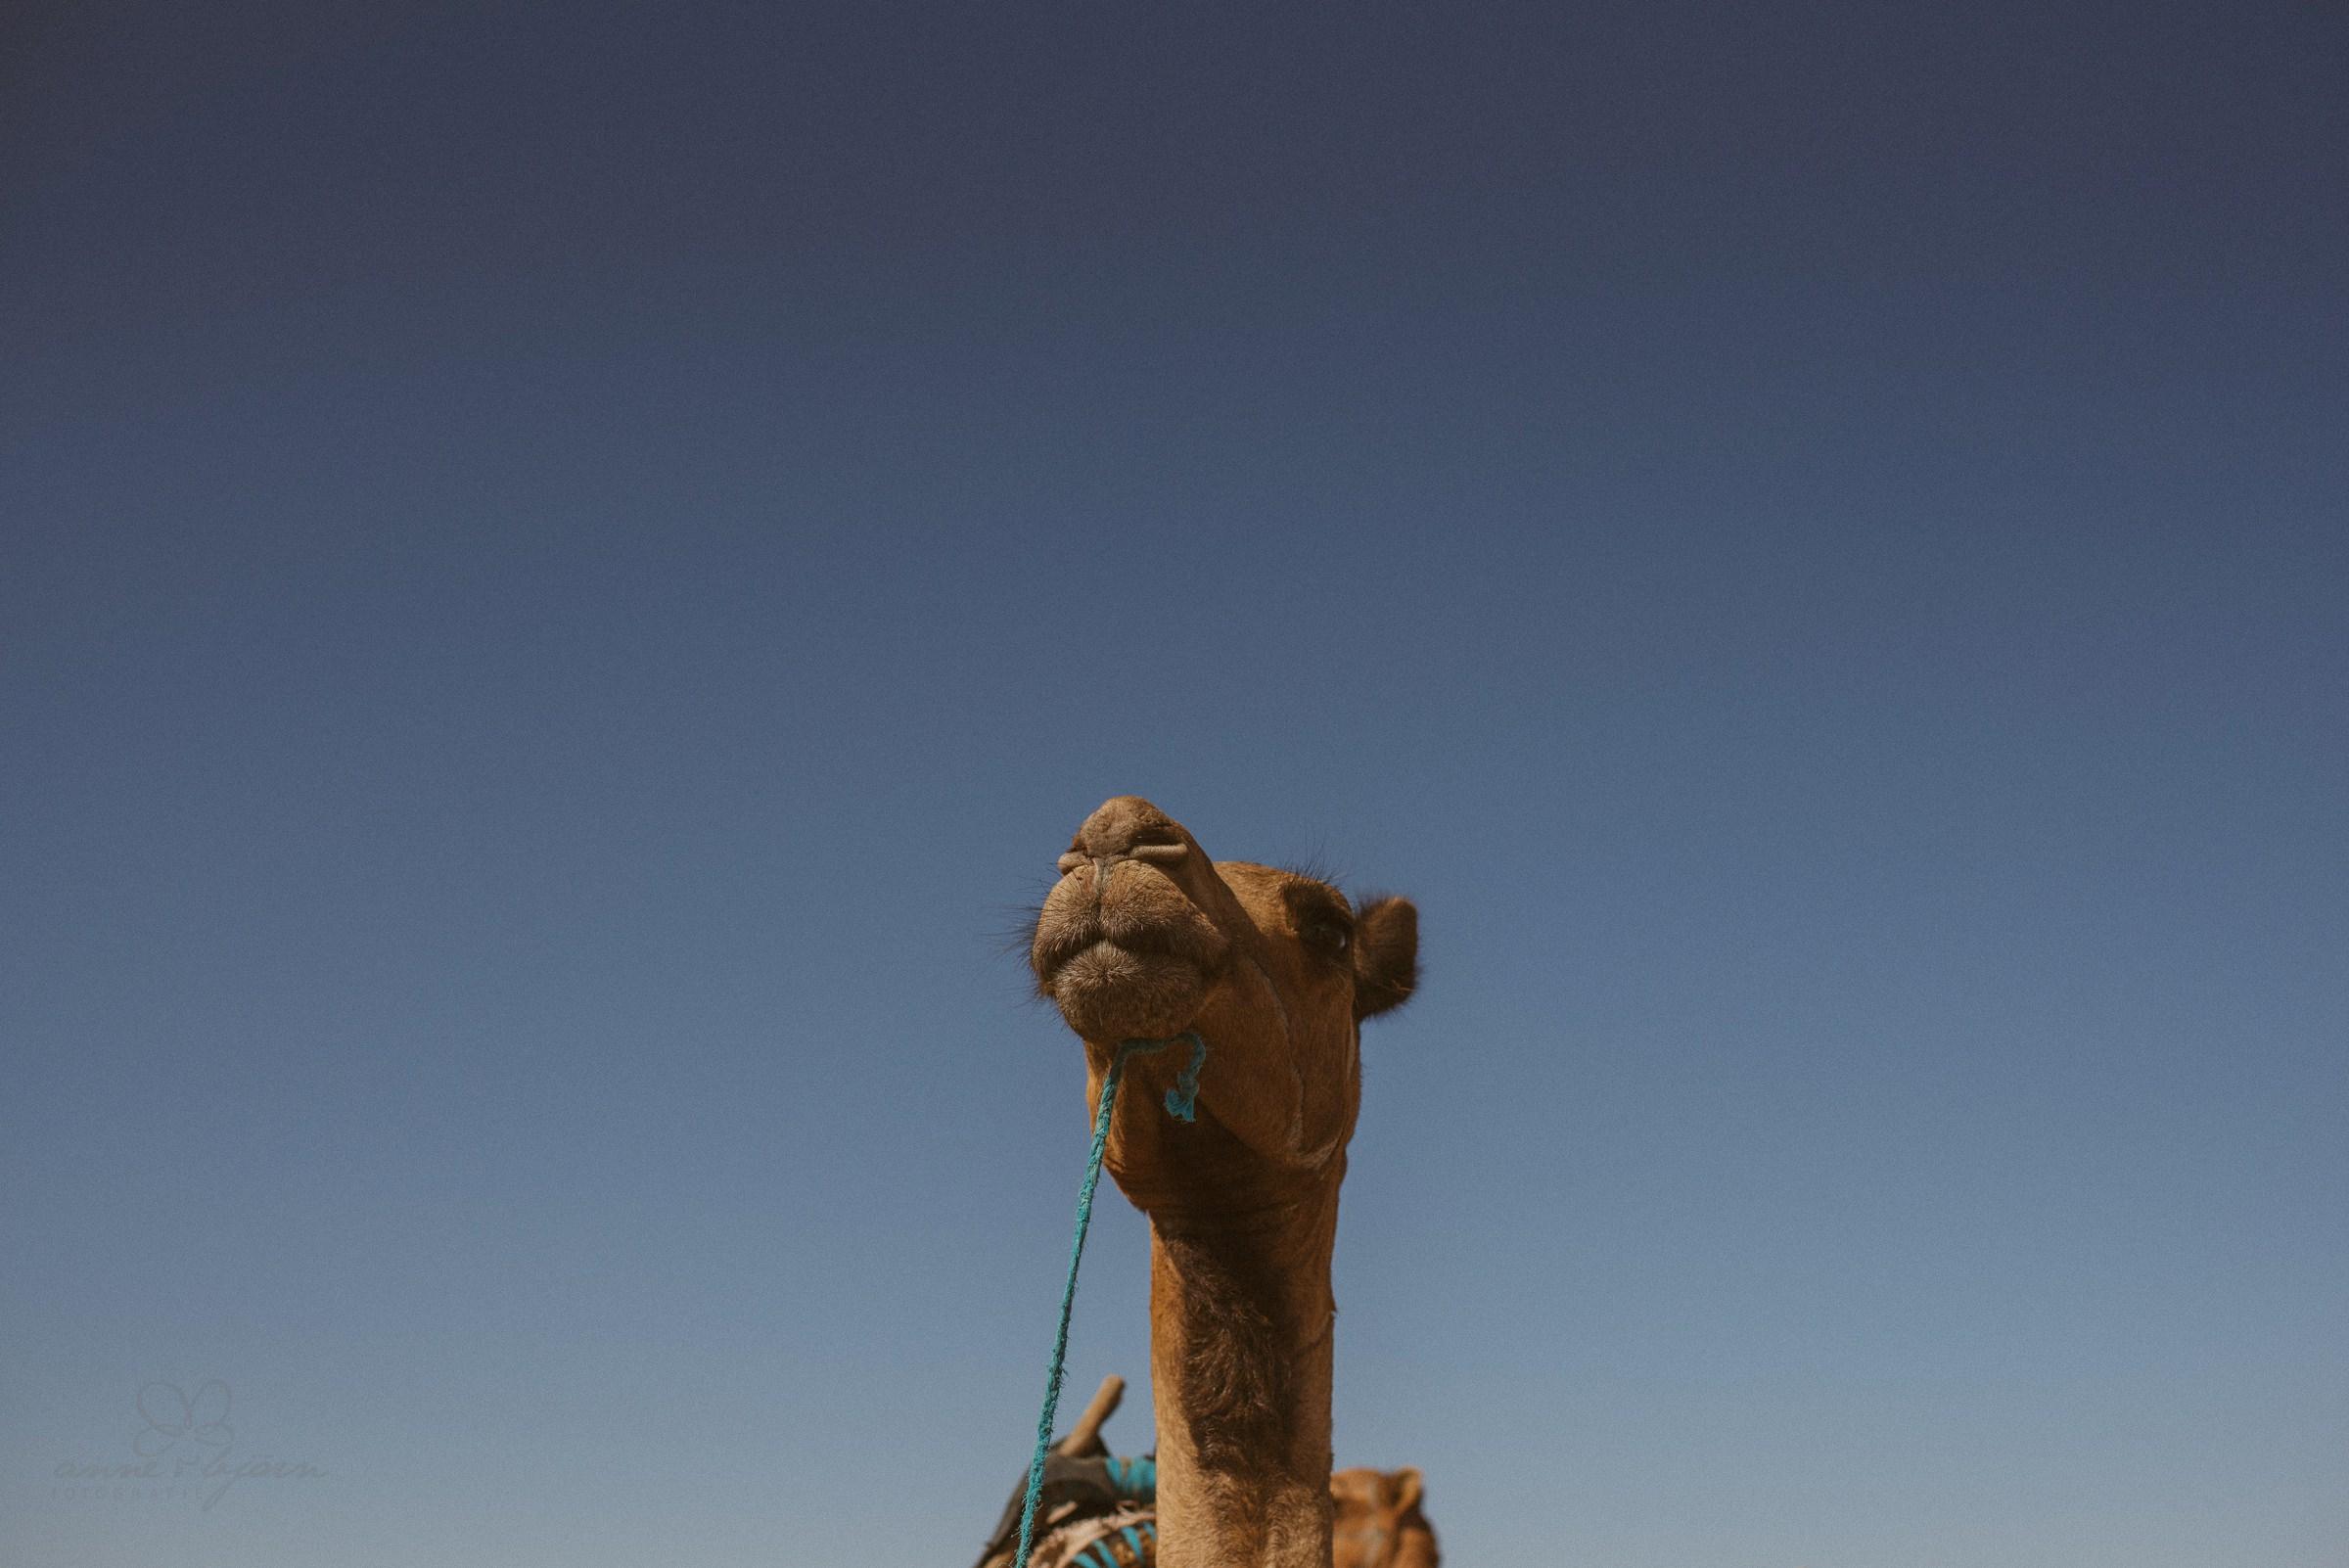 Kamel, Portrait, Nikon D750, 35 mm, Kopf, blau, Himmer, kreativ